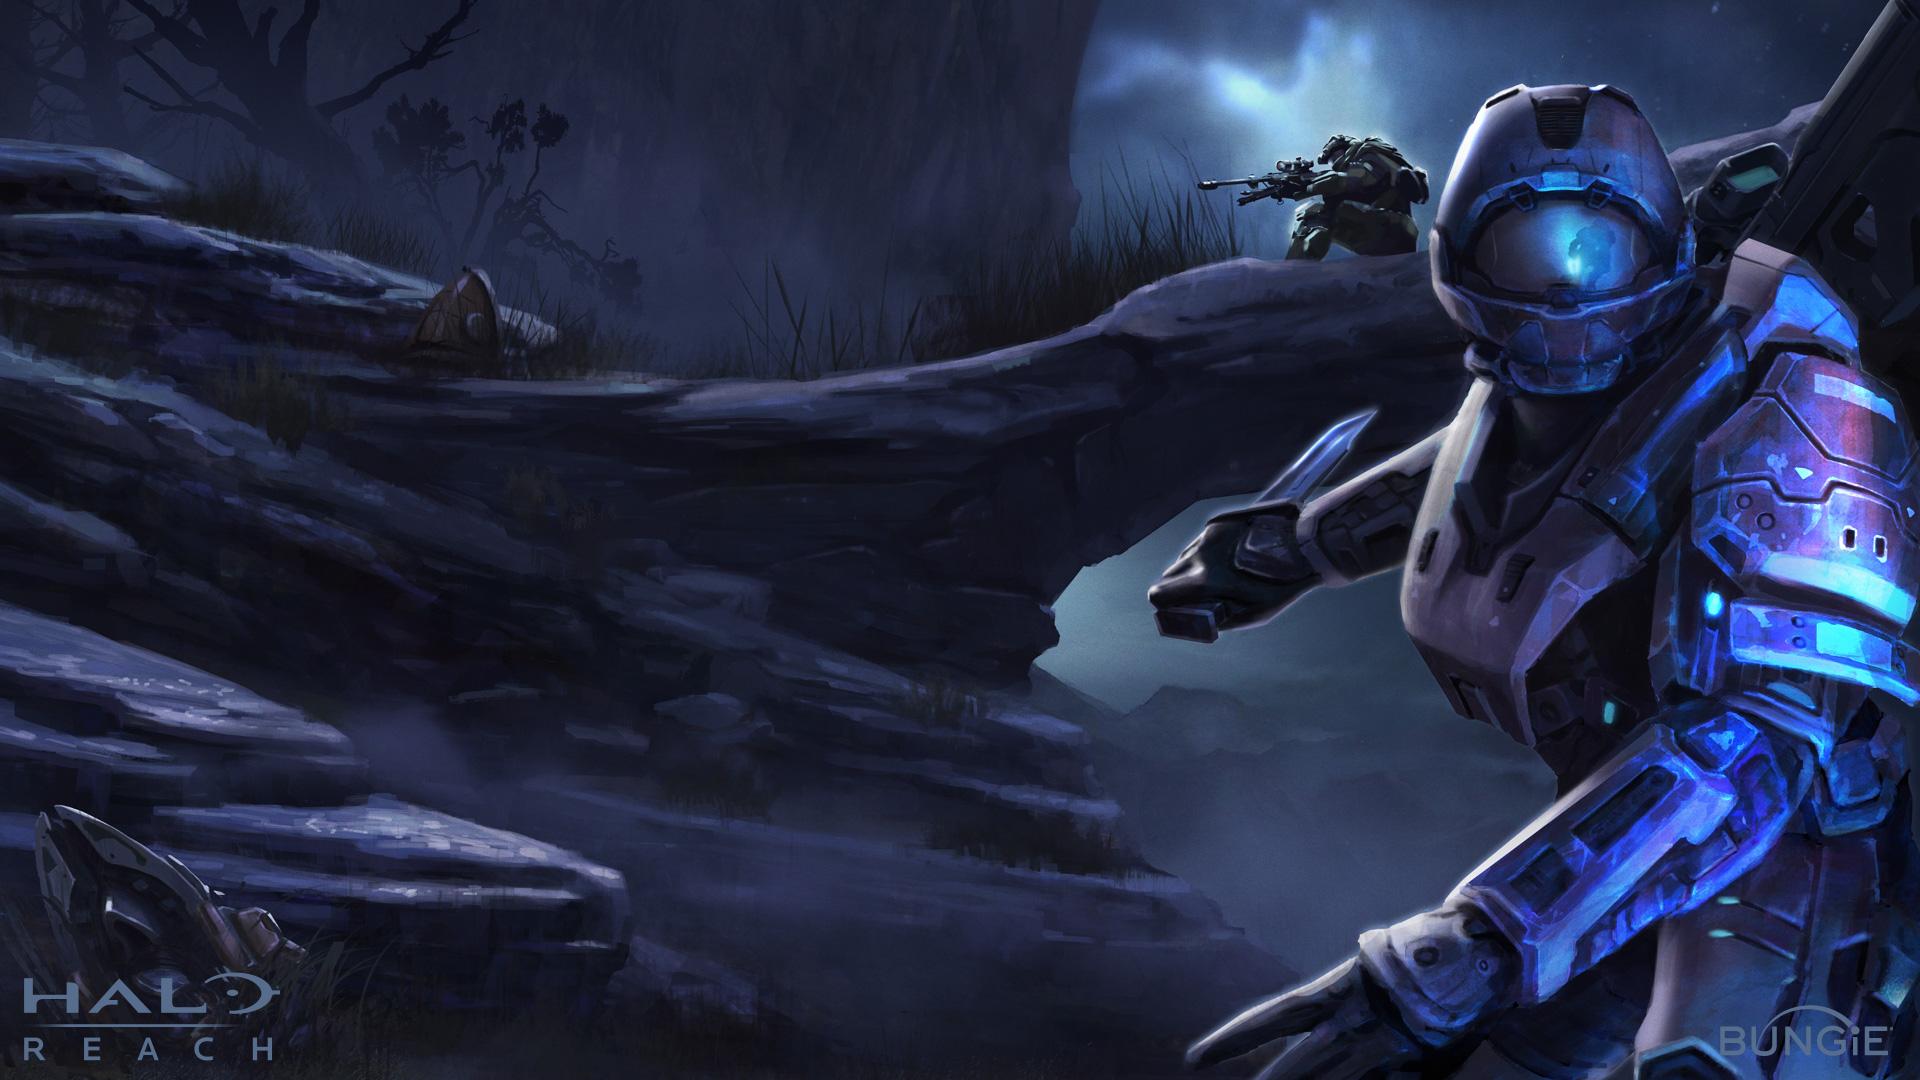 Halo: Reach Wallpaper in 1920x1080